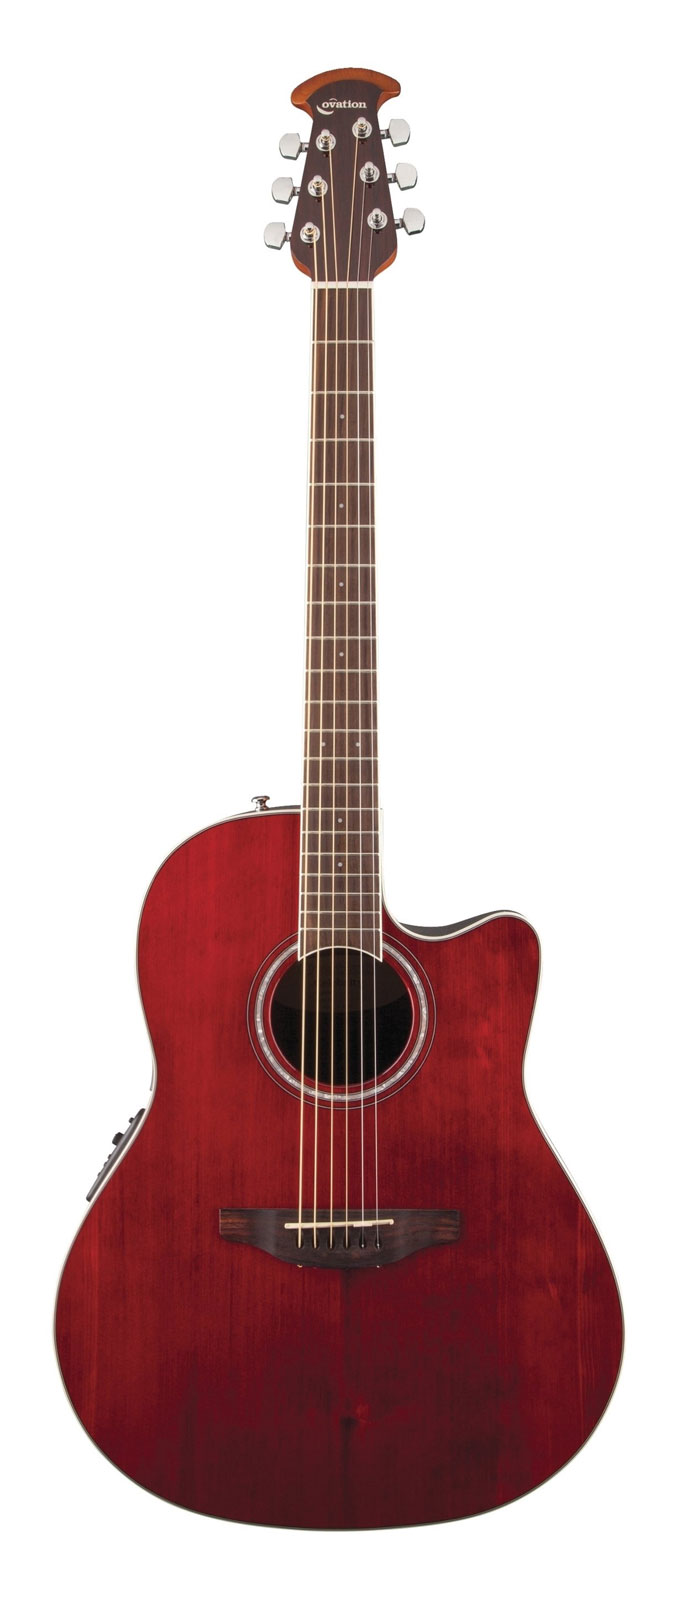 Ovation Celebrity Standard Cs24rr Ruby Red